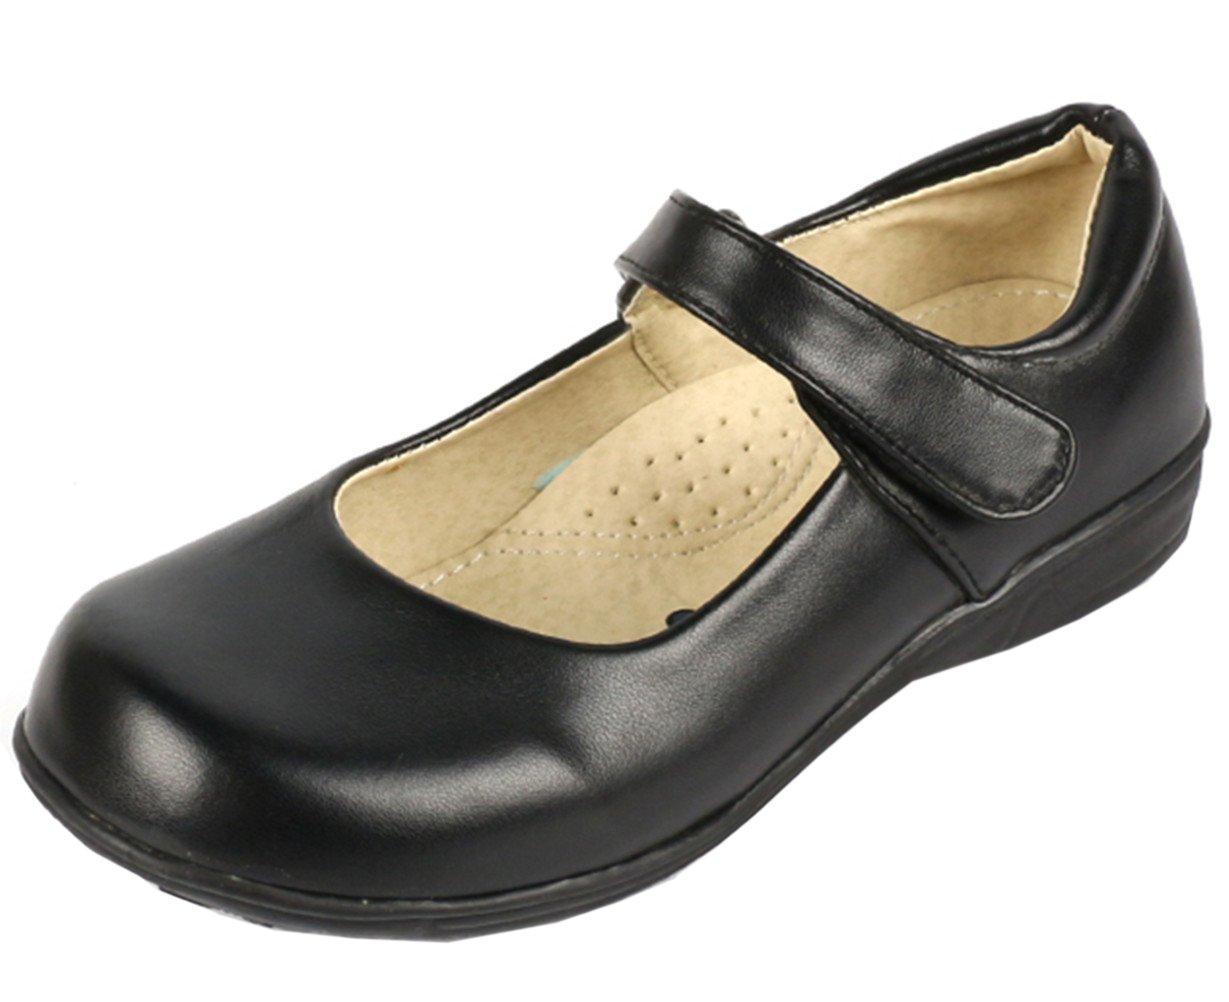 DADAWEN Girl's Strap School Uniform Dress Shoe Mary Jane Flat (Toddler/Little Kid/Big Kid) Black US Size 1 M Little Kid